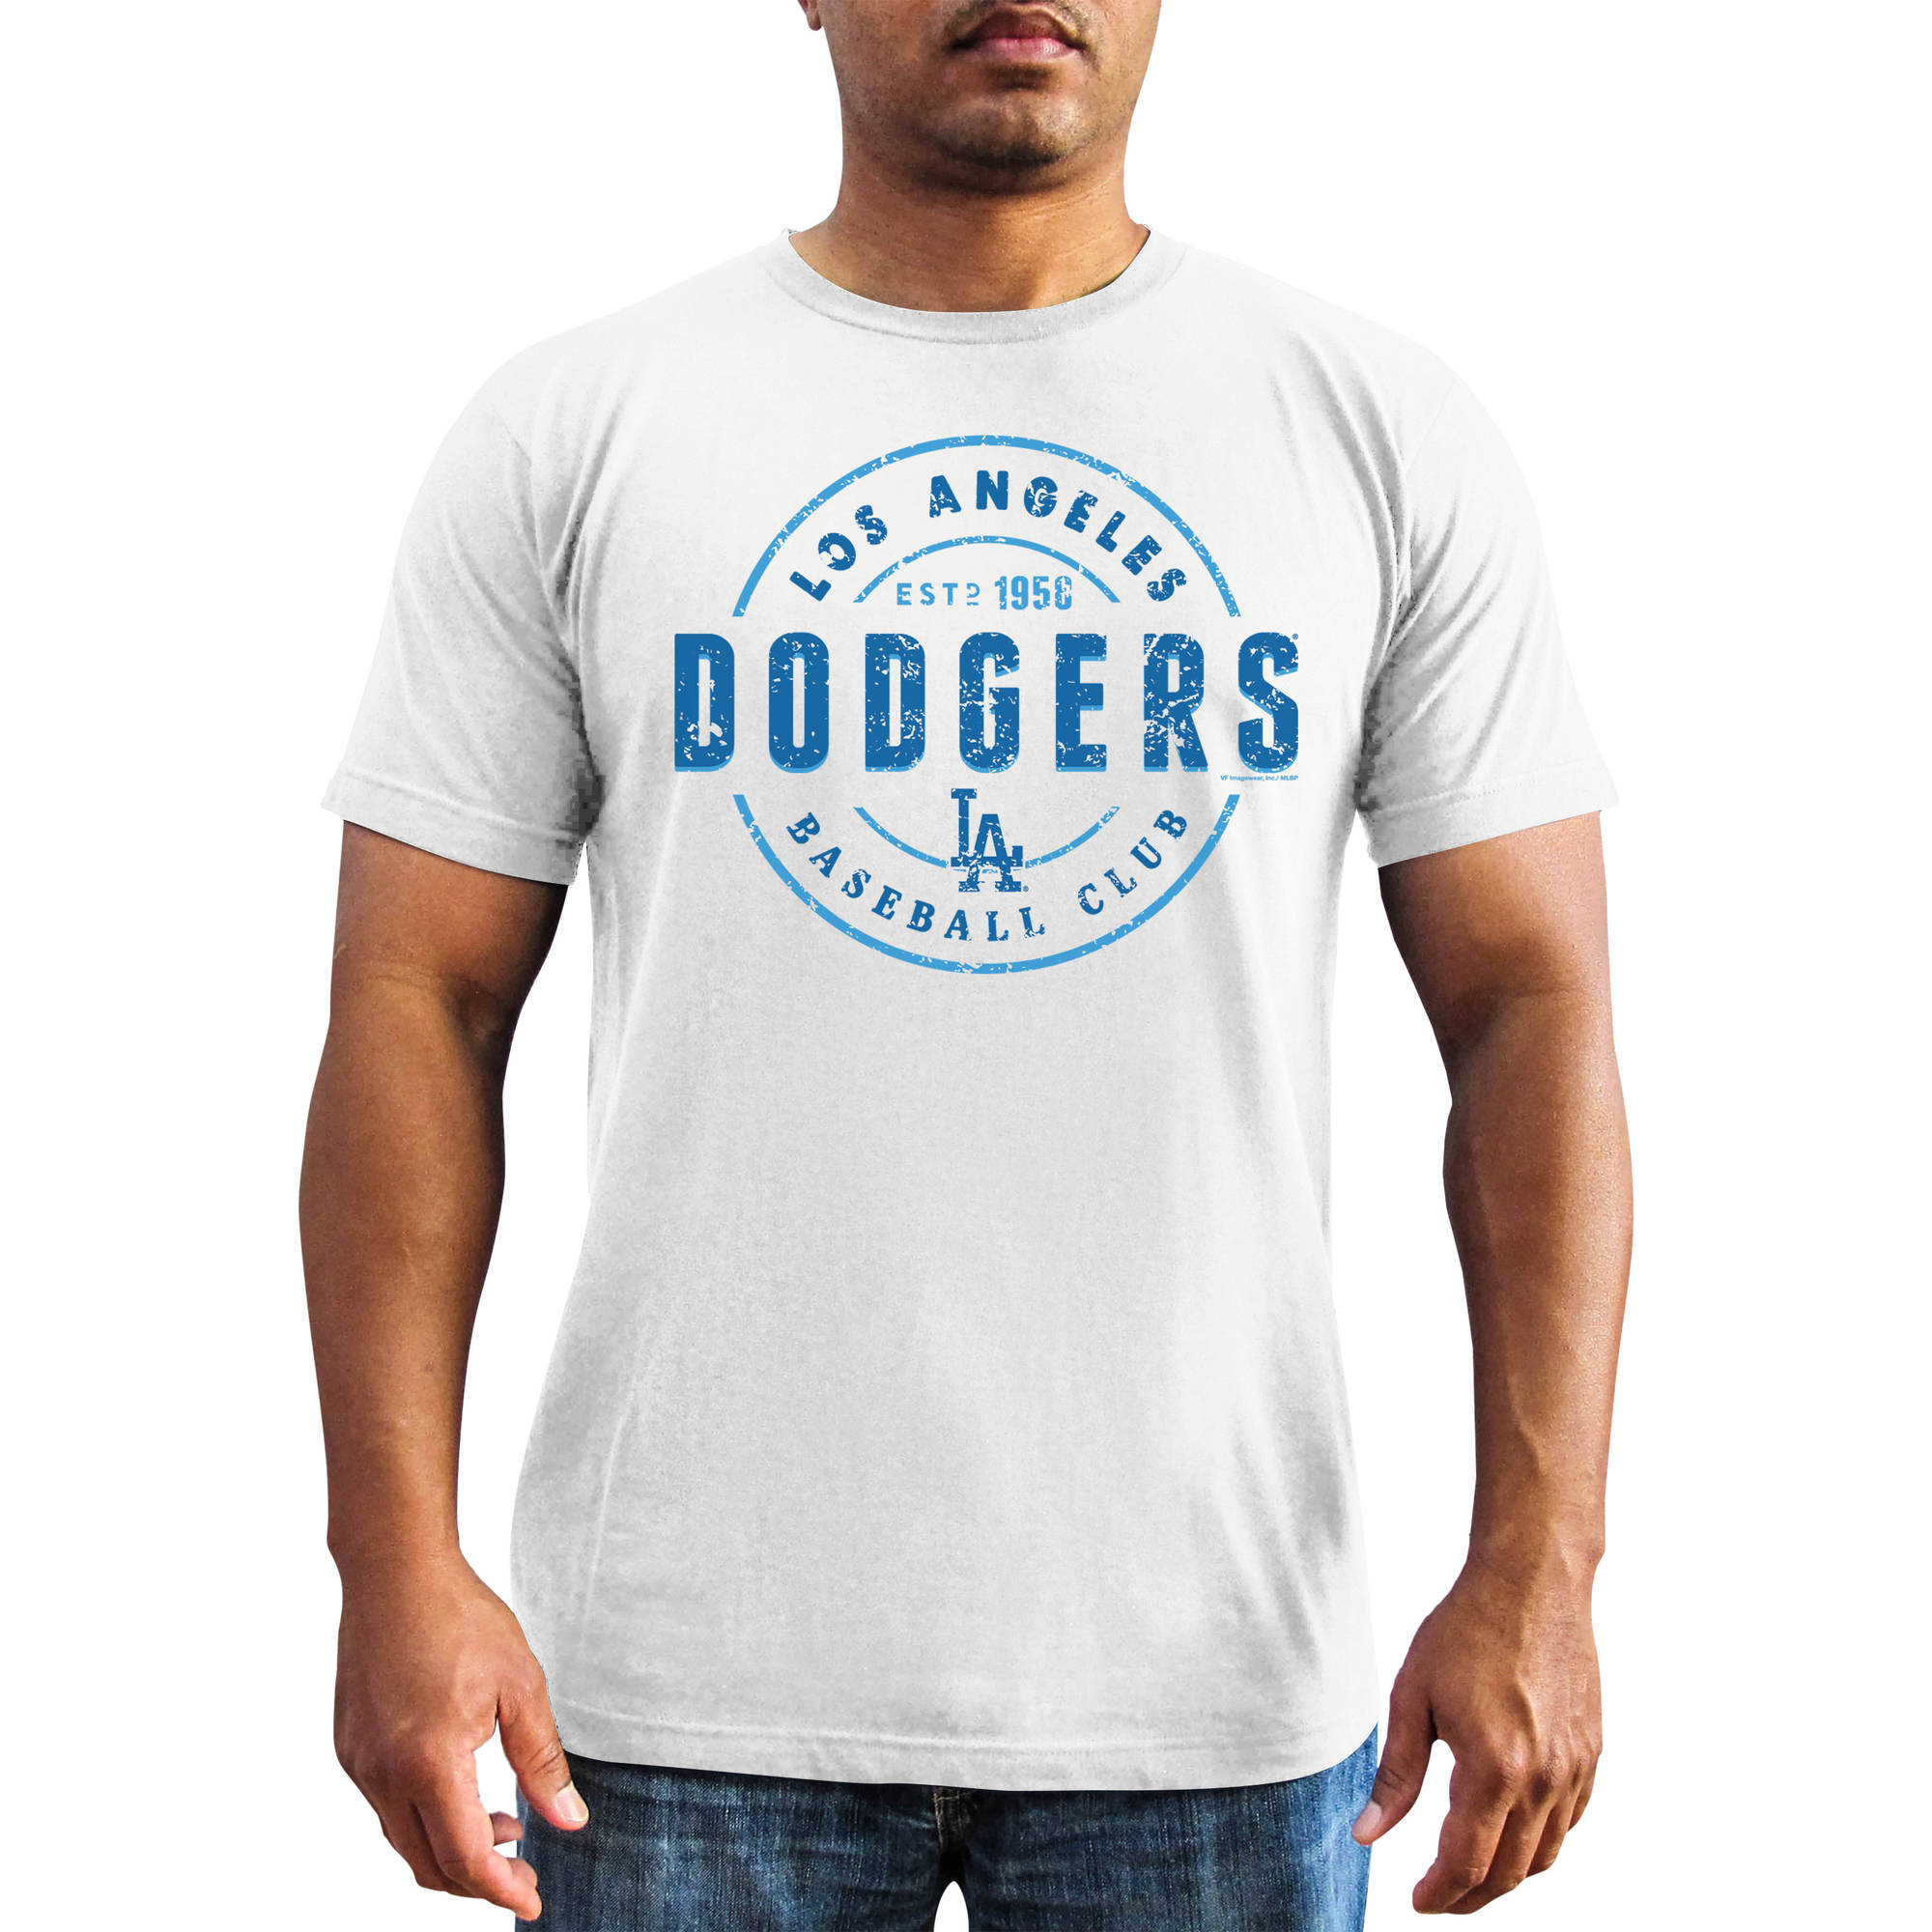 MLB - Big Mens Los Angeles Dodgers Short Sleeve Team Tee